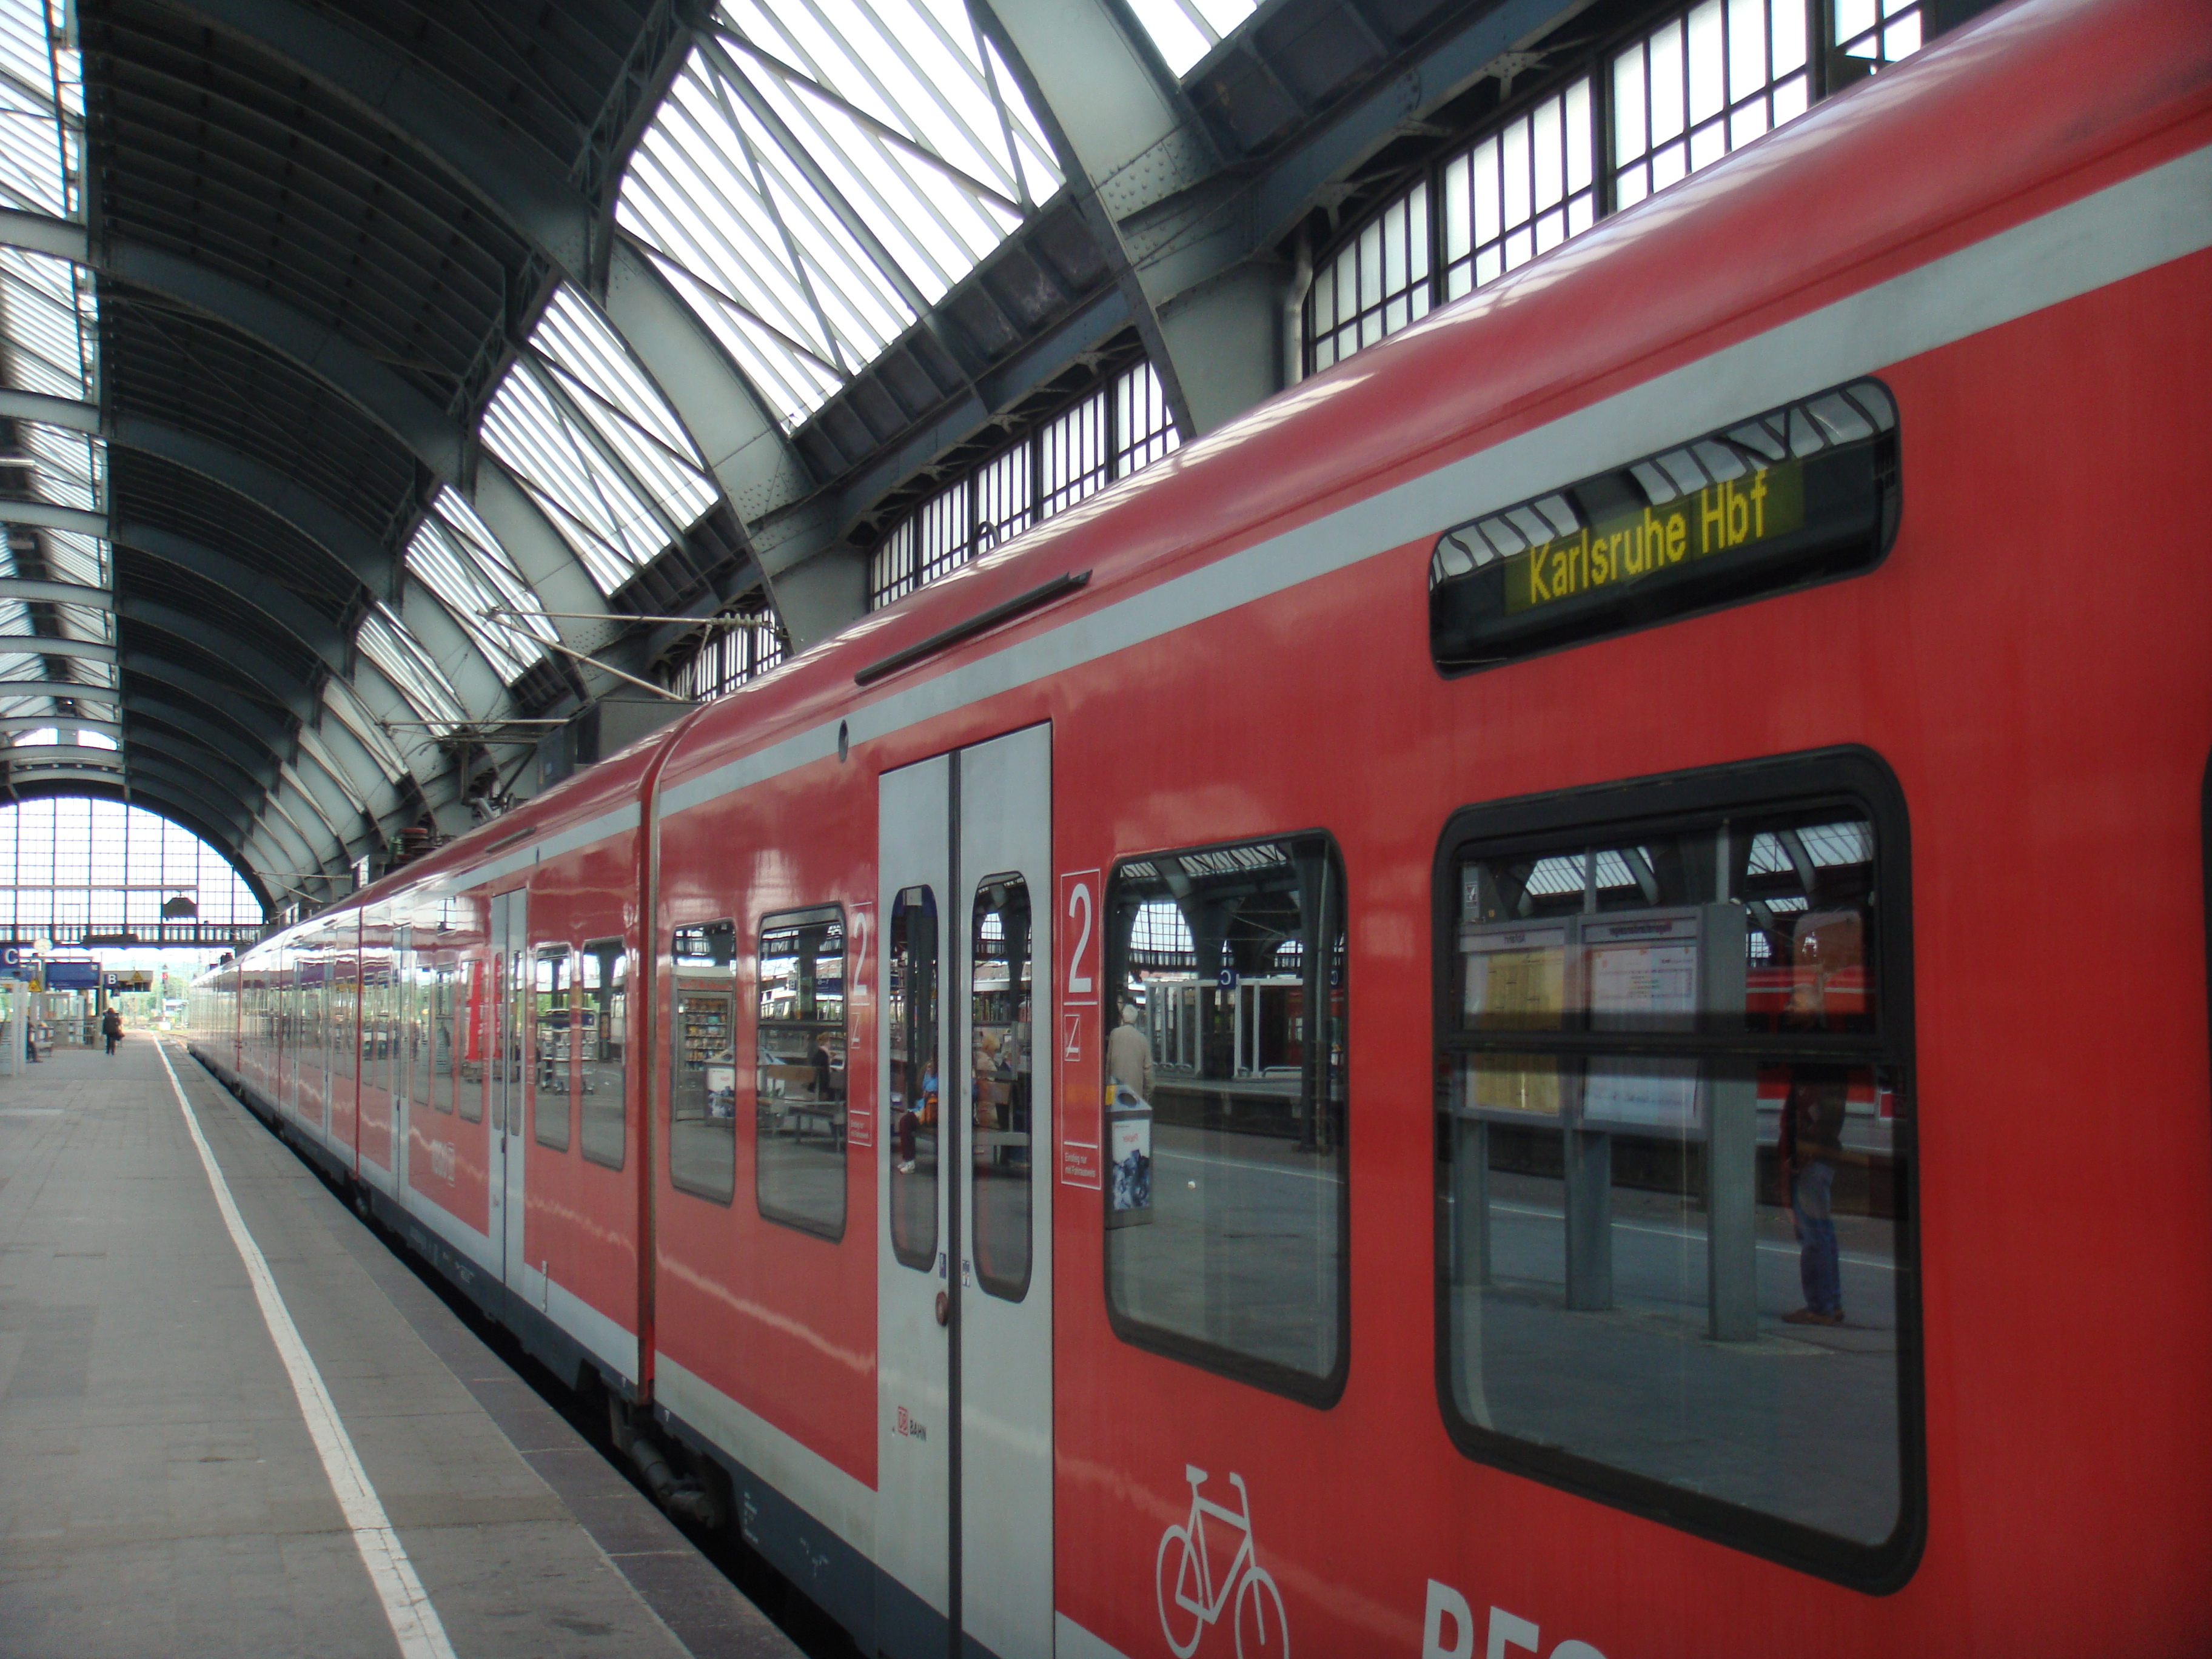 RE nach Karlsruhe